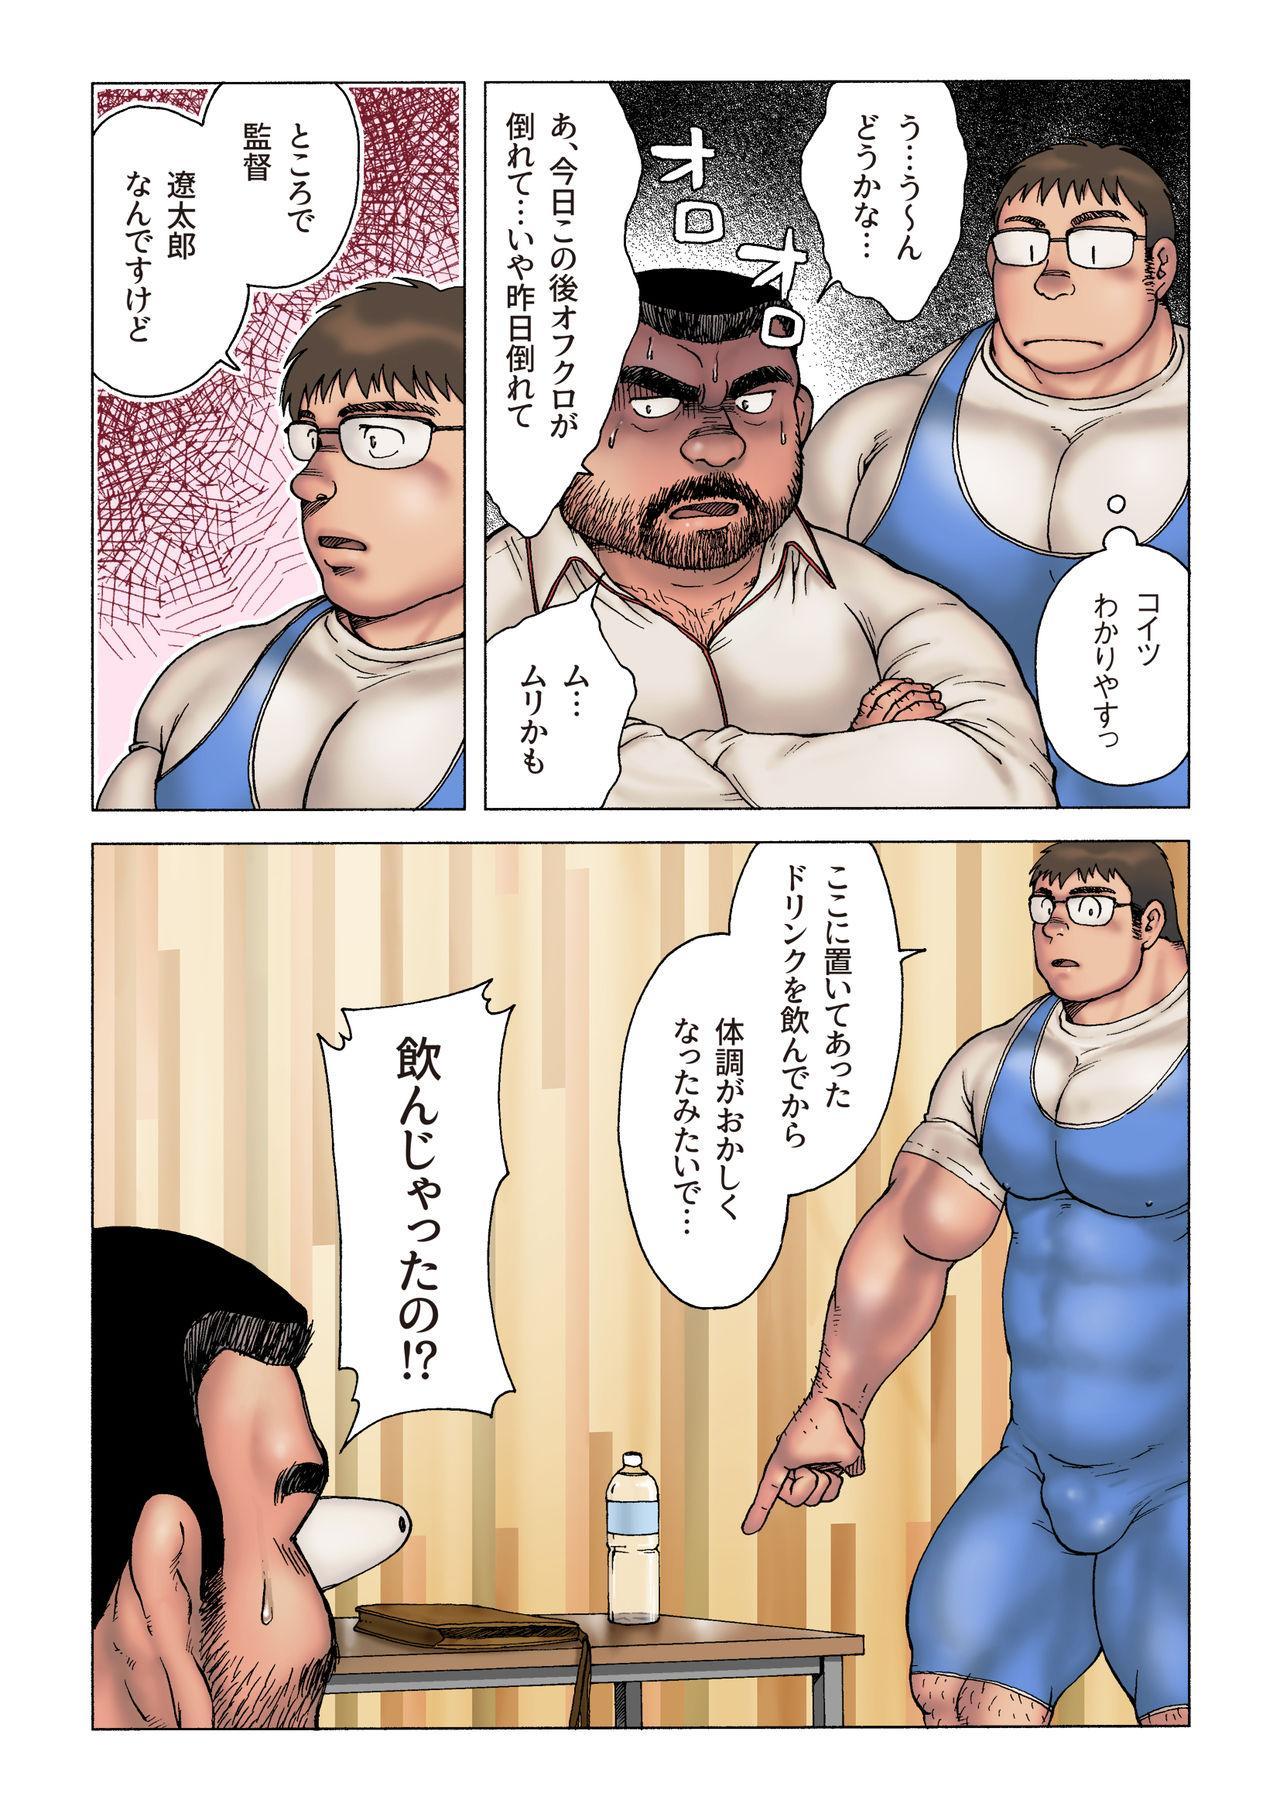 Danshi Koukousei Weightlifter Shiai-chuu, Osae kirenai Wakai Takeri 14